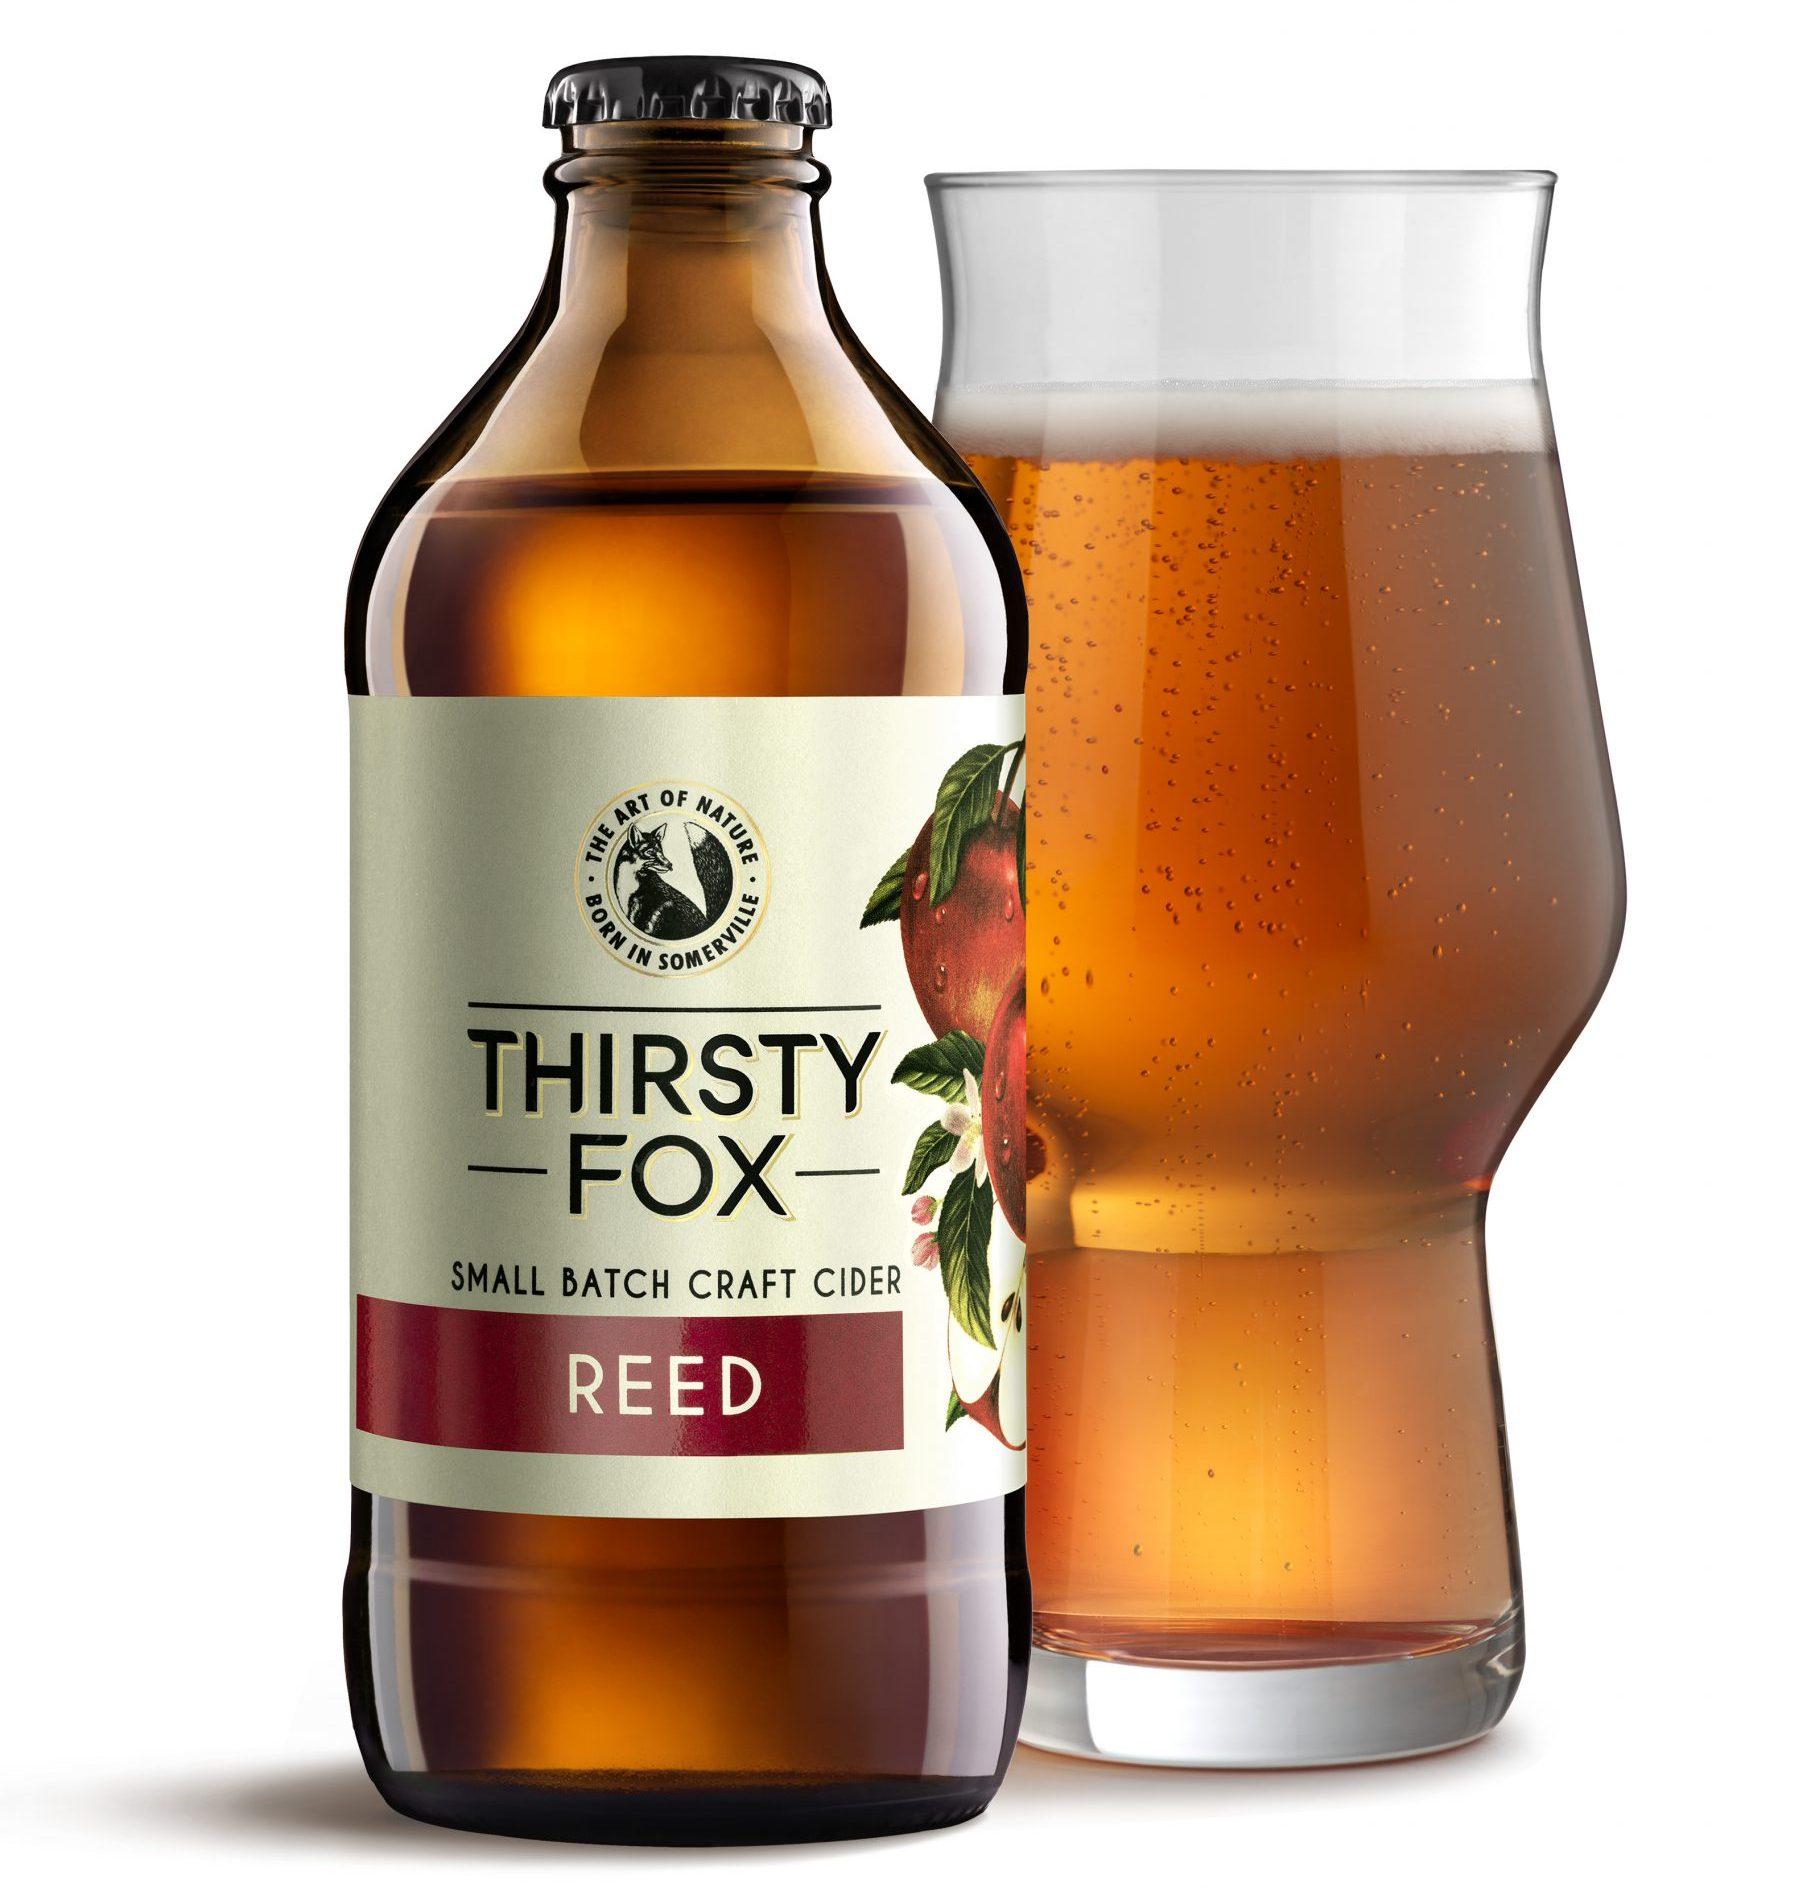 Thirsty Fox Cider